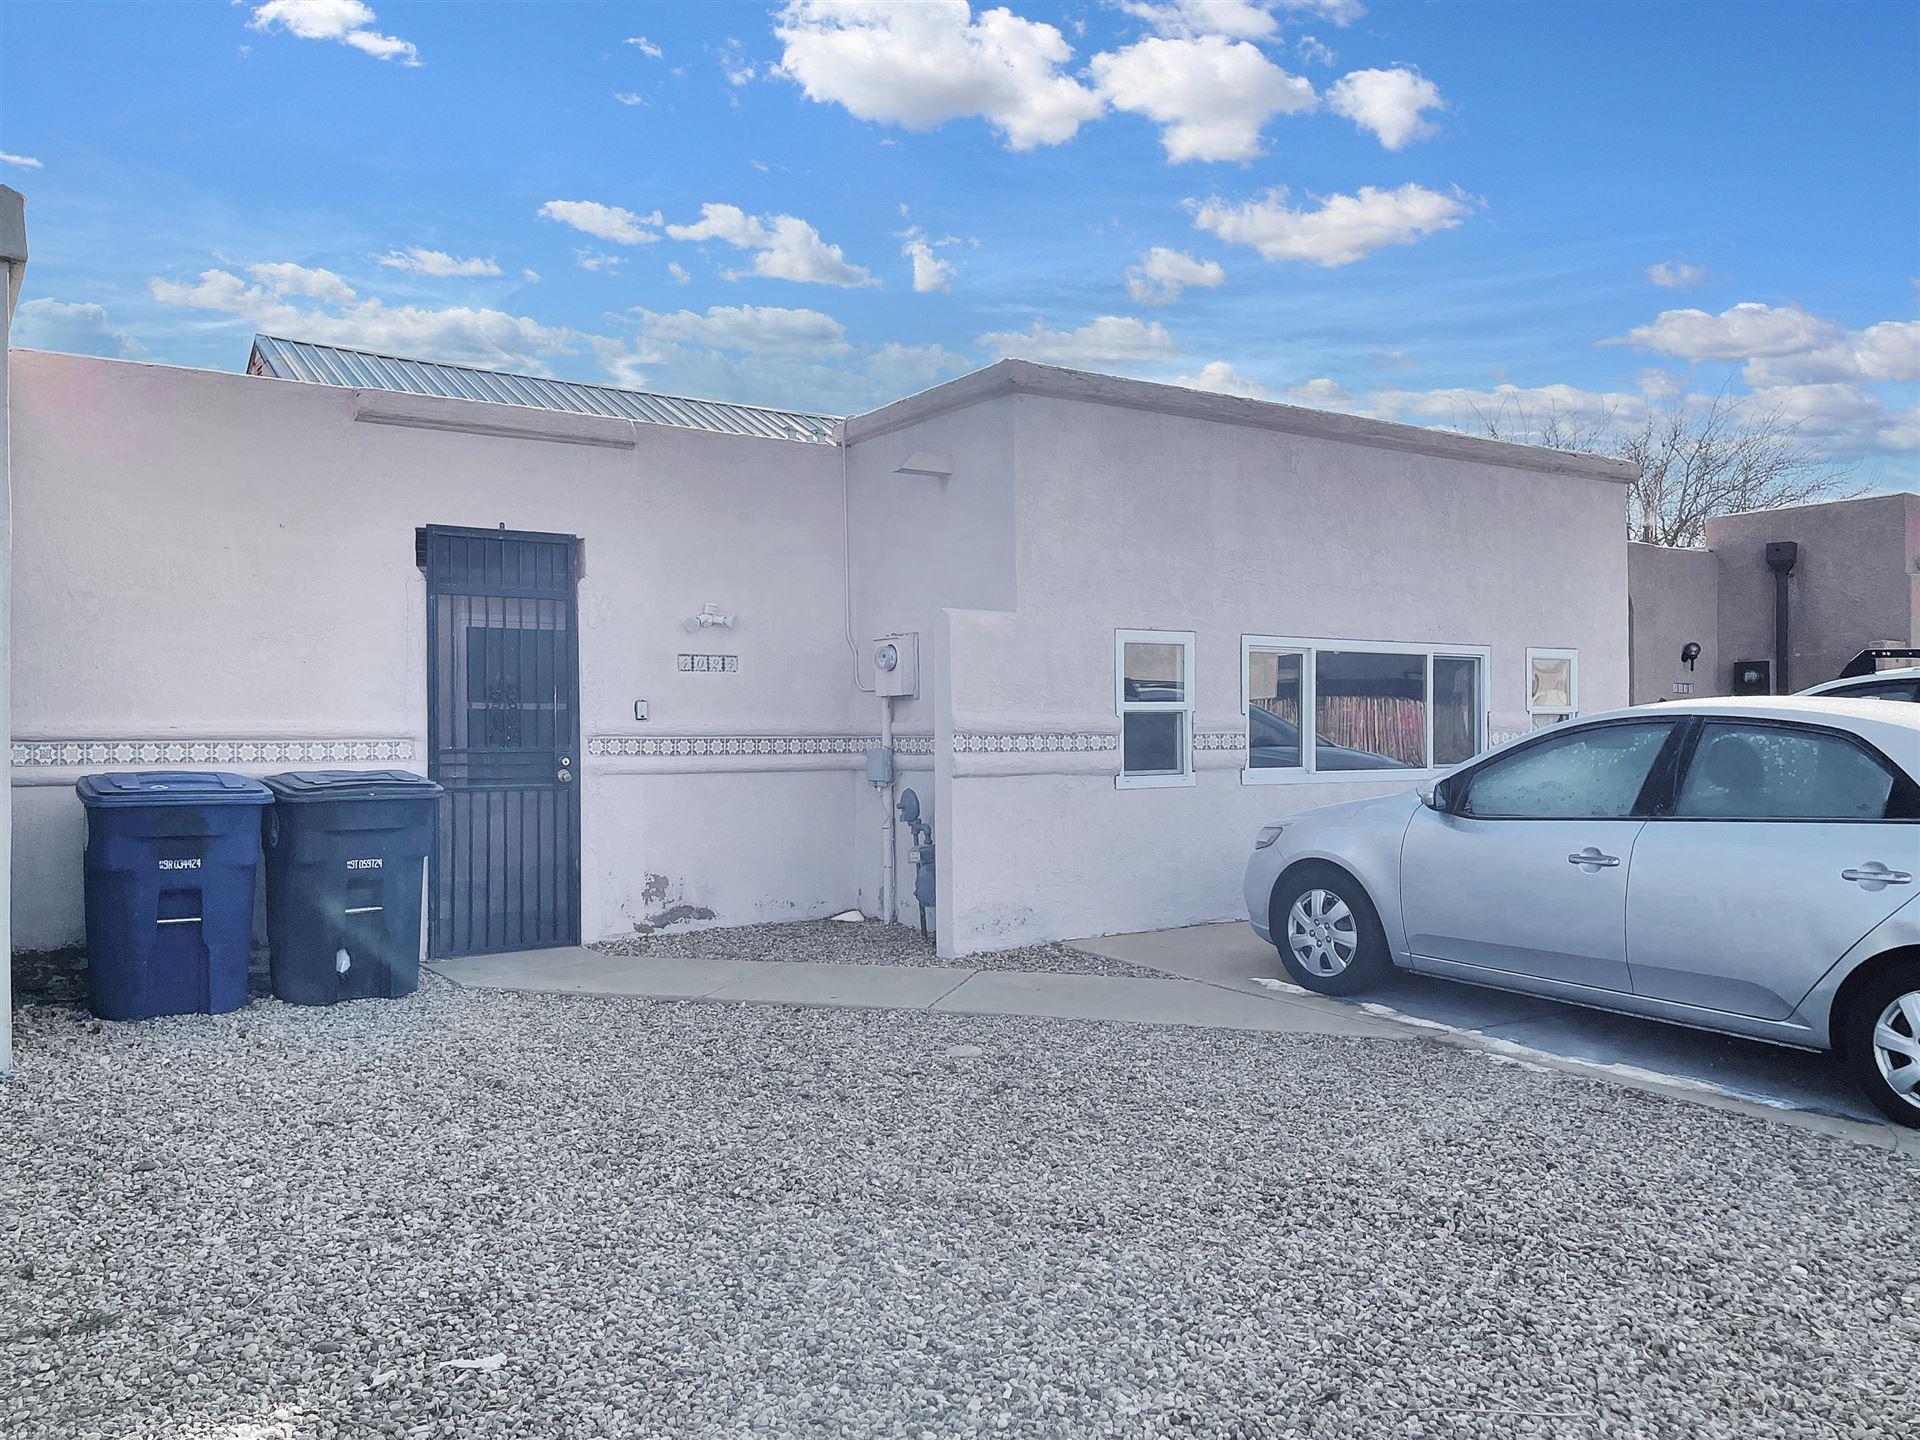 4024 67TH Street NW, Albuquerque, NM 87120 - MLS#: 986259